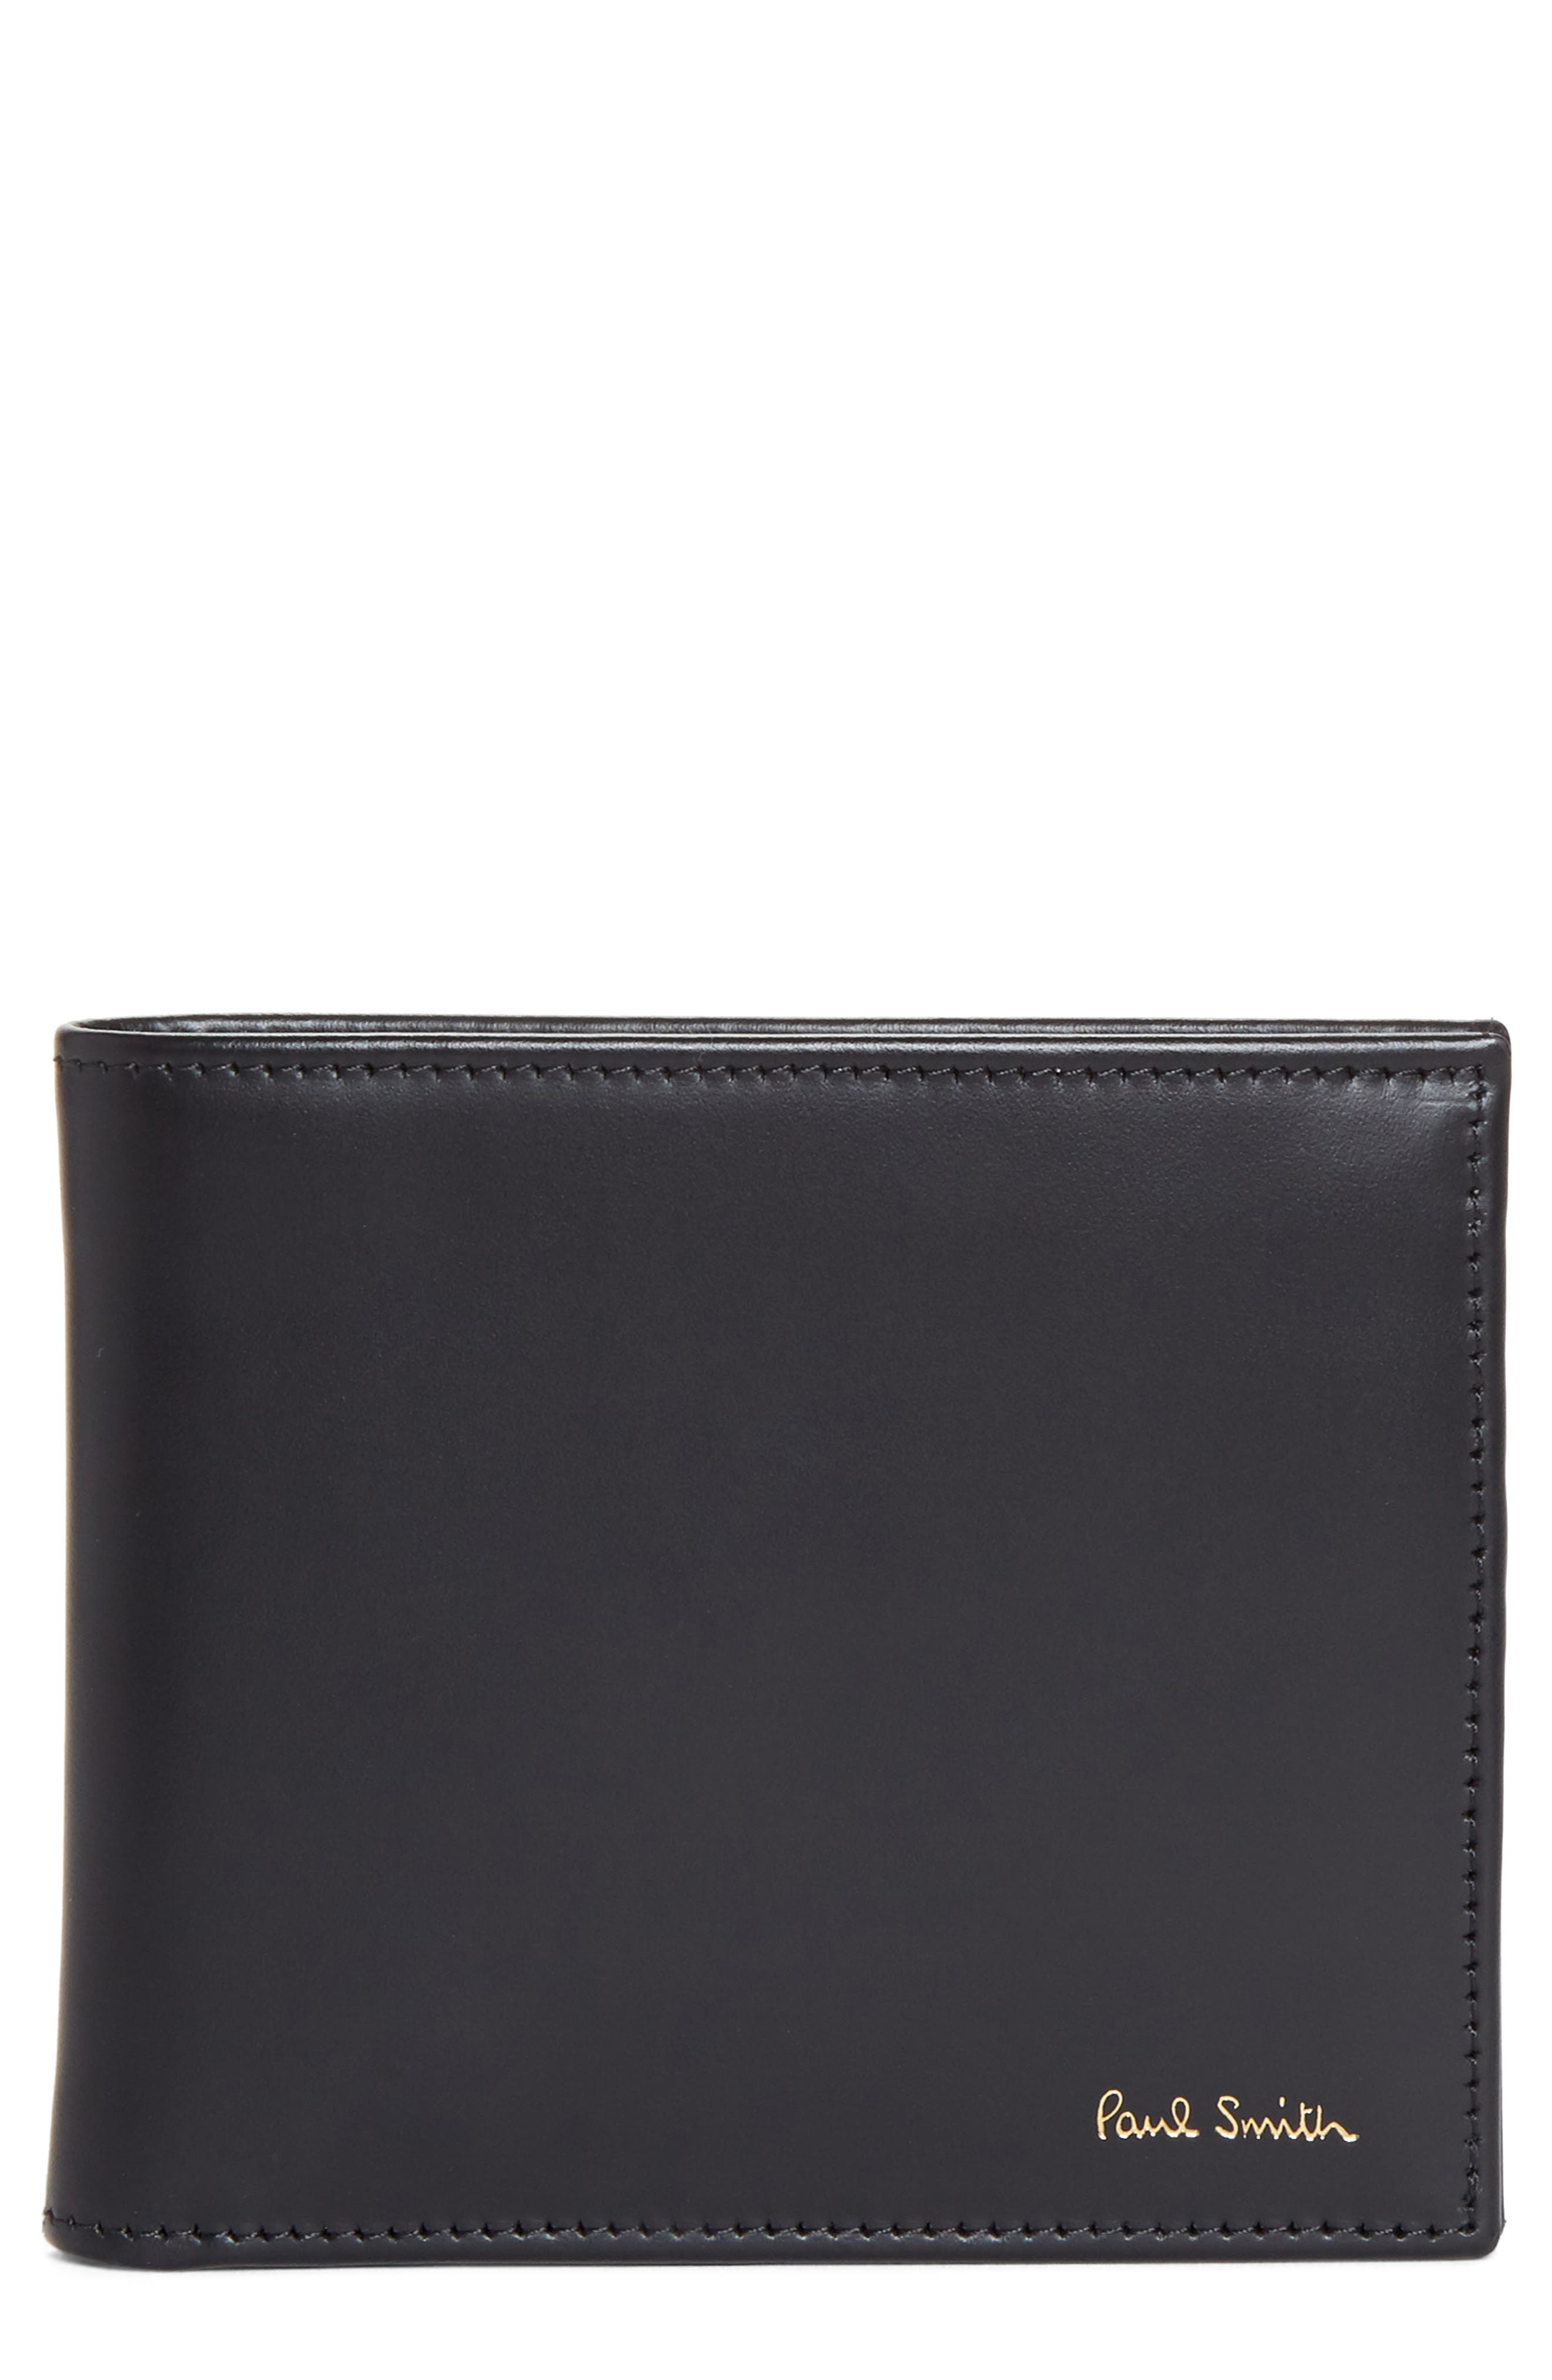 Multistripe Leather Wallet,                         Main,                         color,